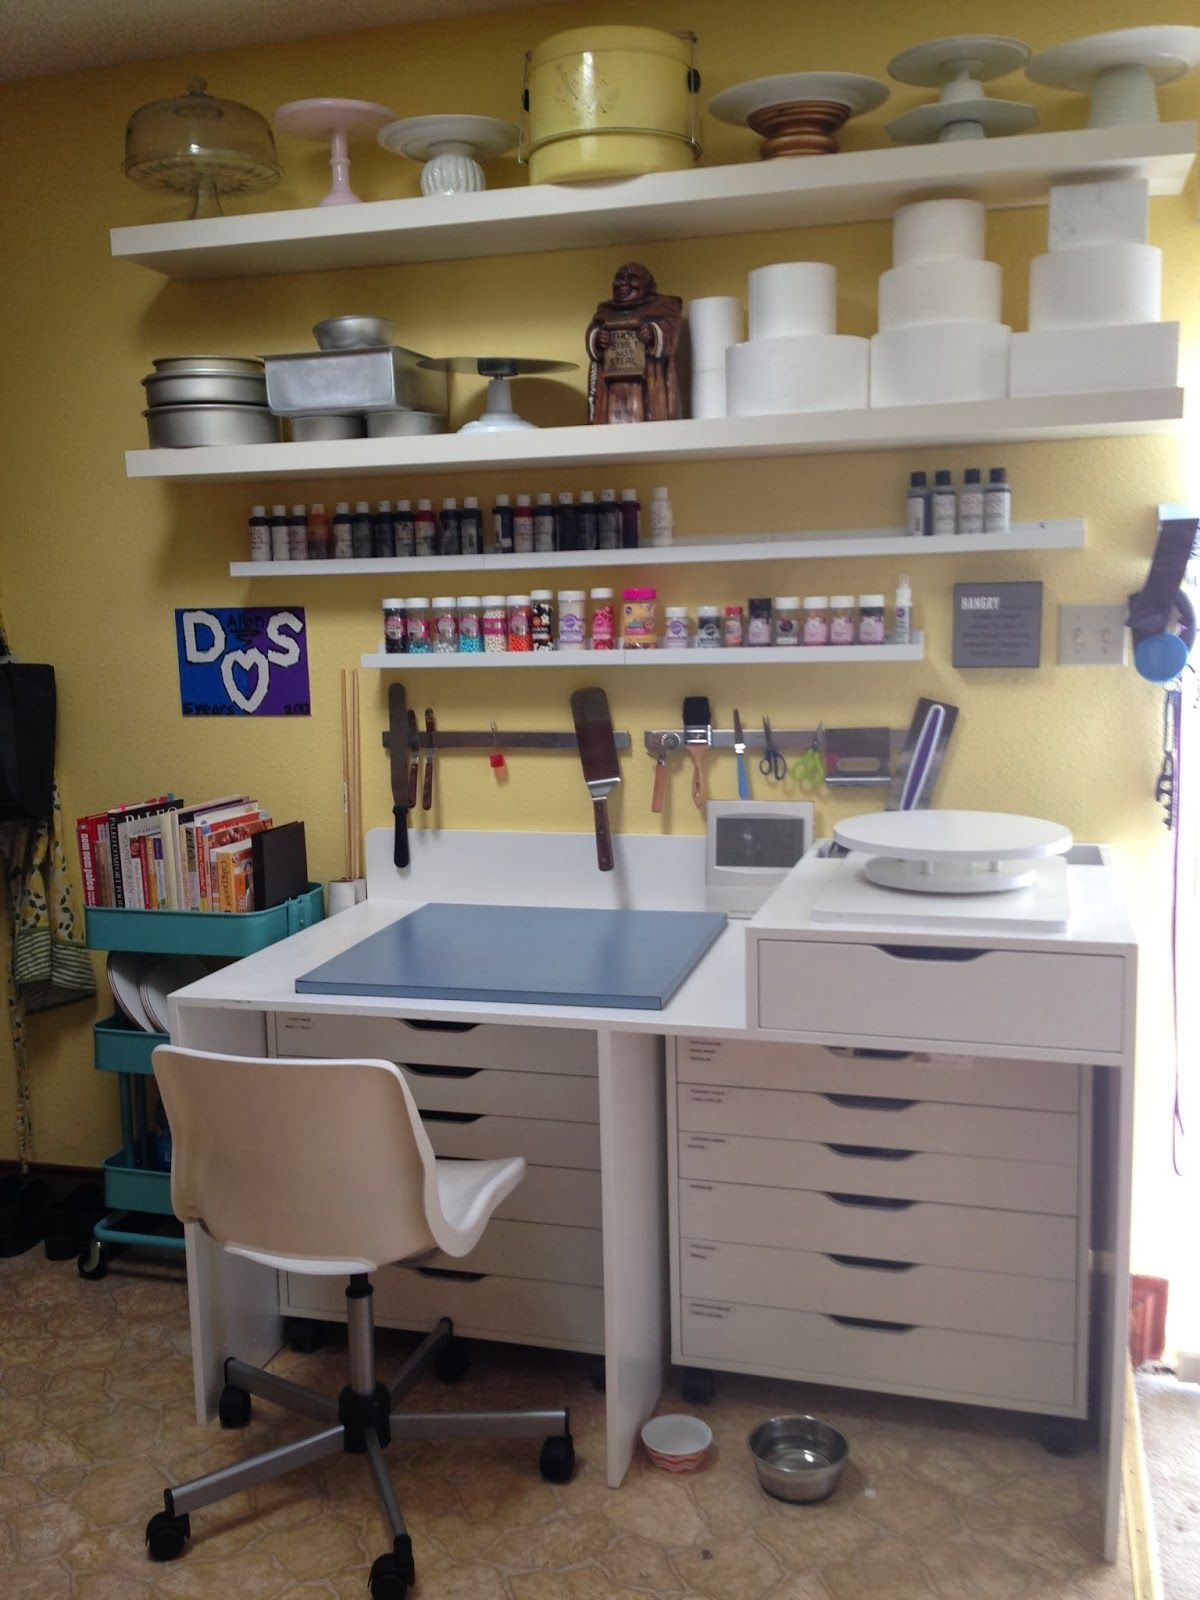 Free Room Design Tool: Where SAB Cakes Lives! Cake Room, Cake Area, Cake Supplies